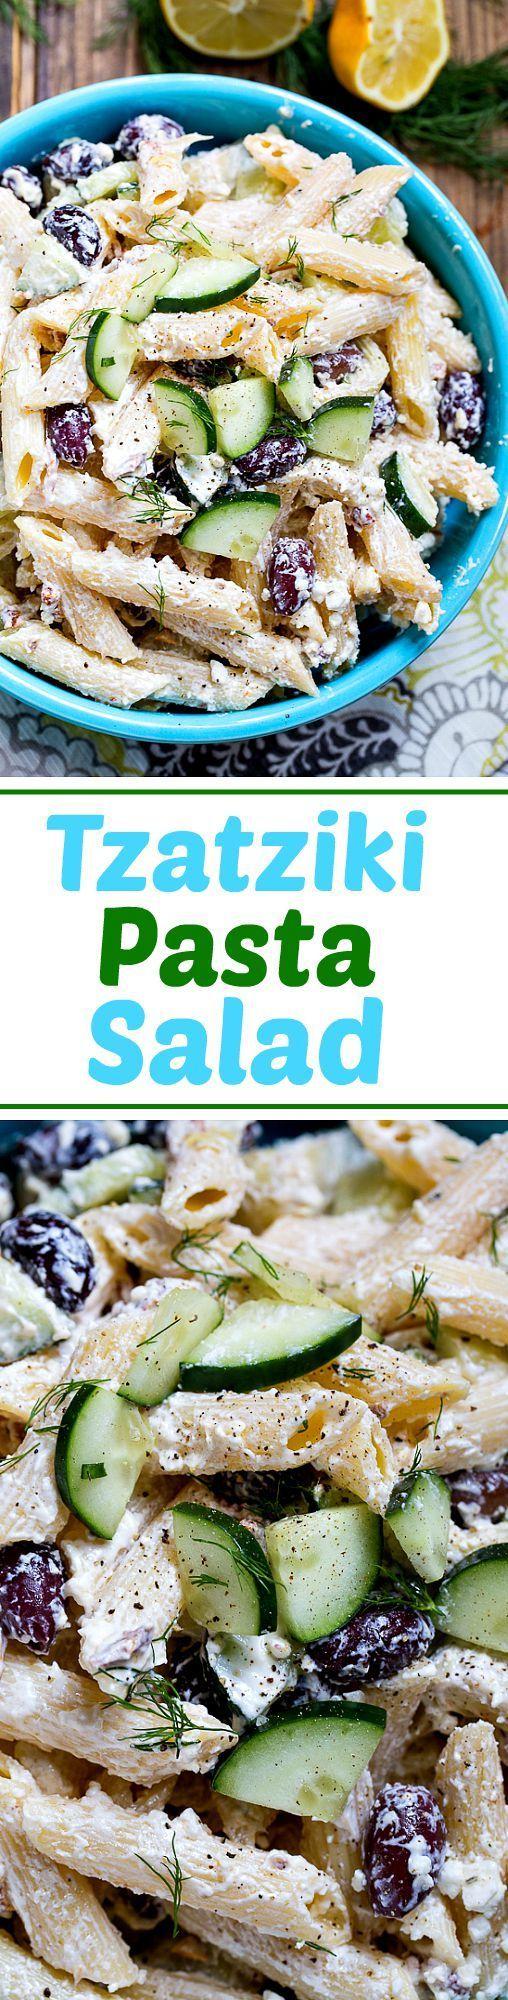 166 best RECIPES Pasta Salad images on Pinterest | Rezepte, Cooking ...